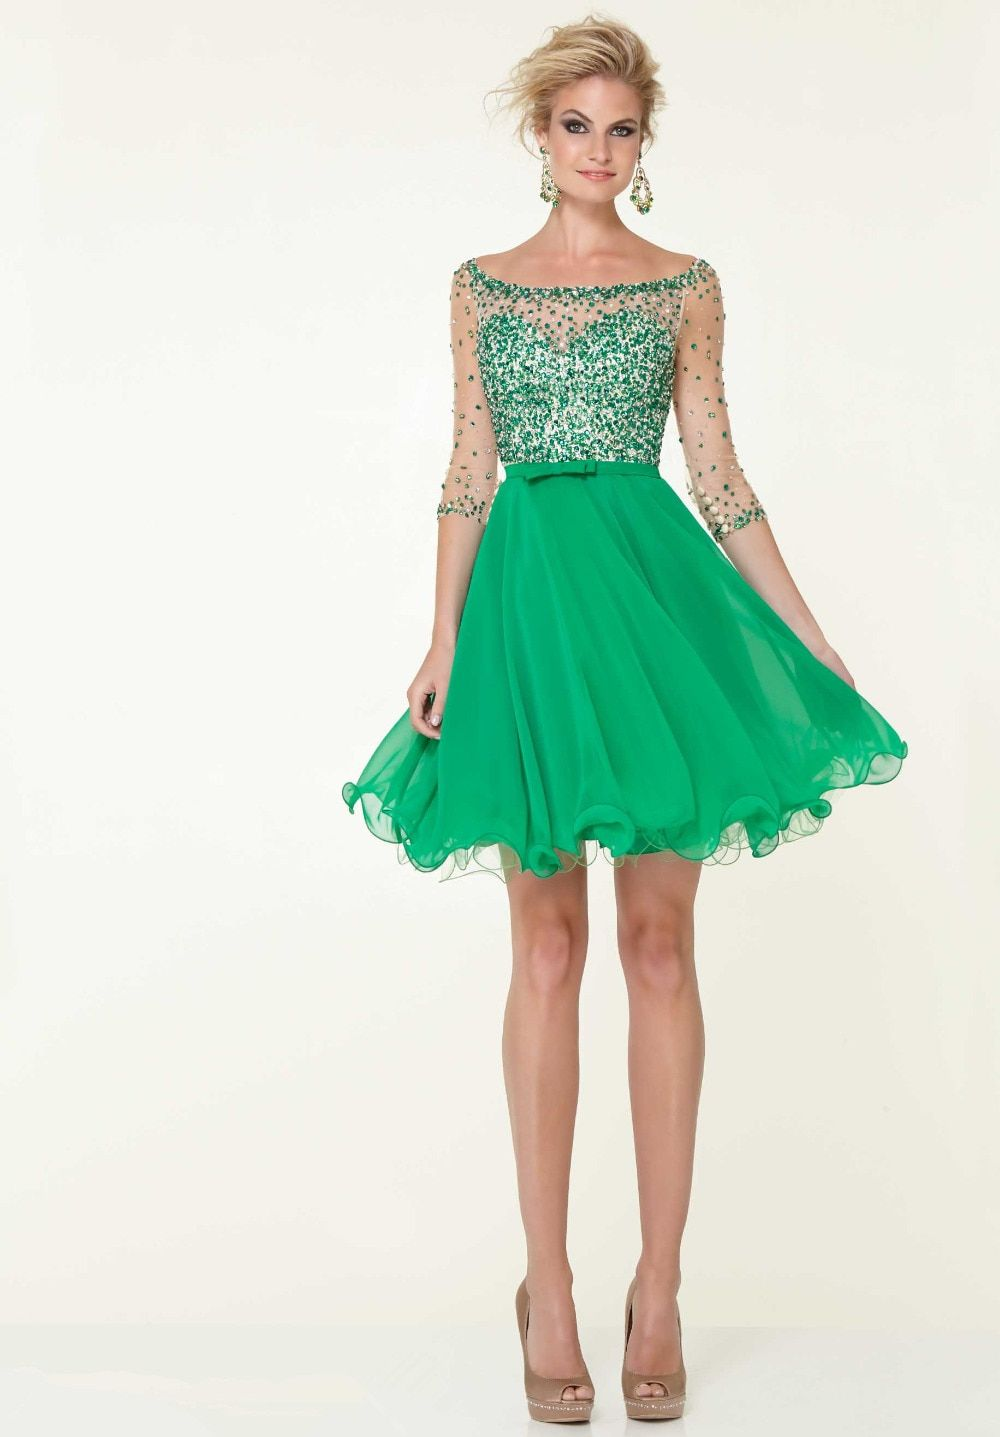 Hot sale green short dresses 8th grade prom